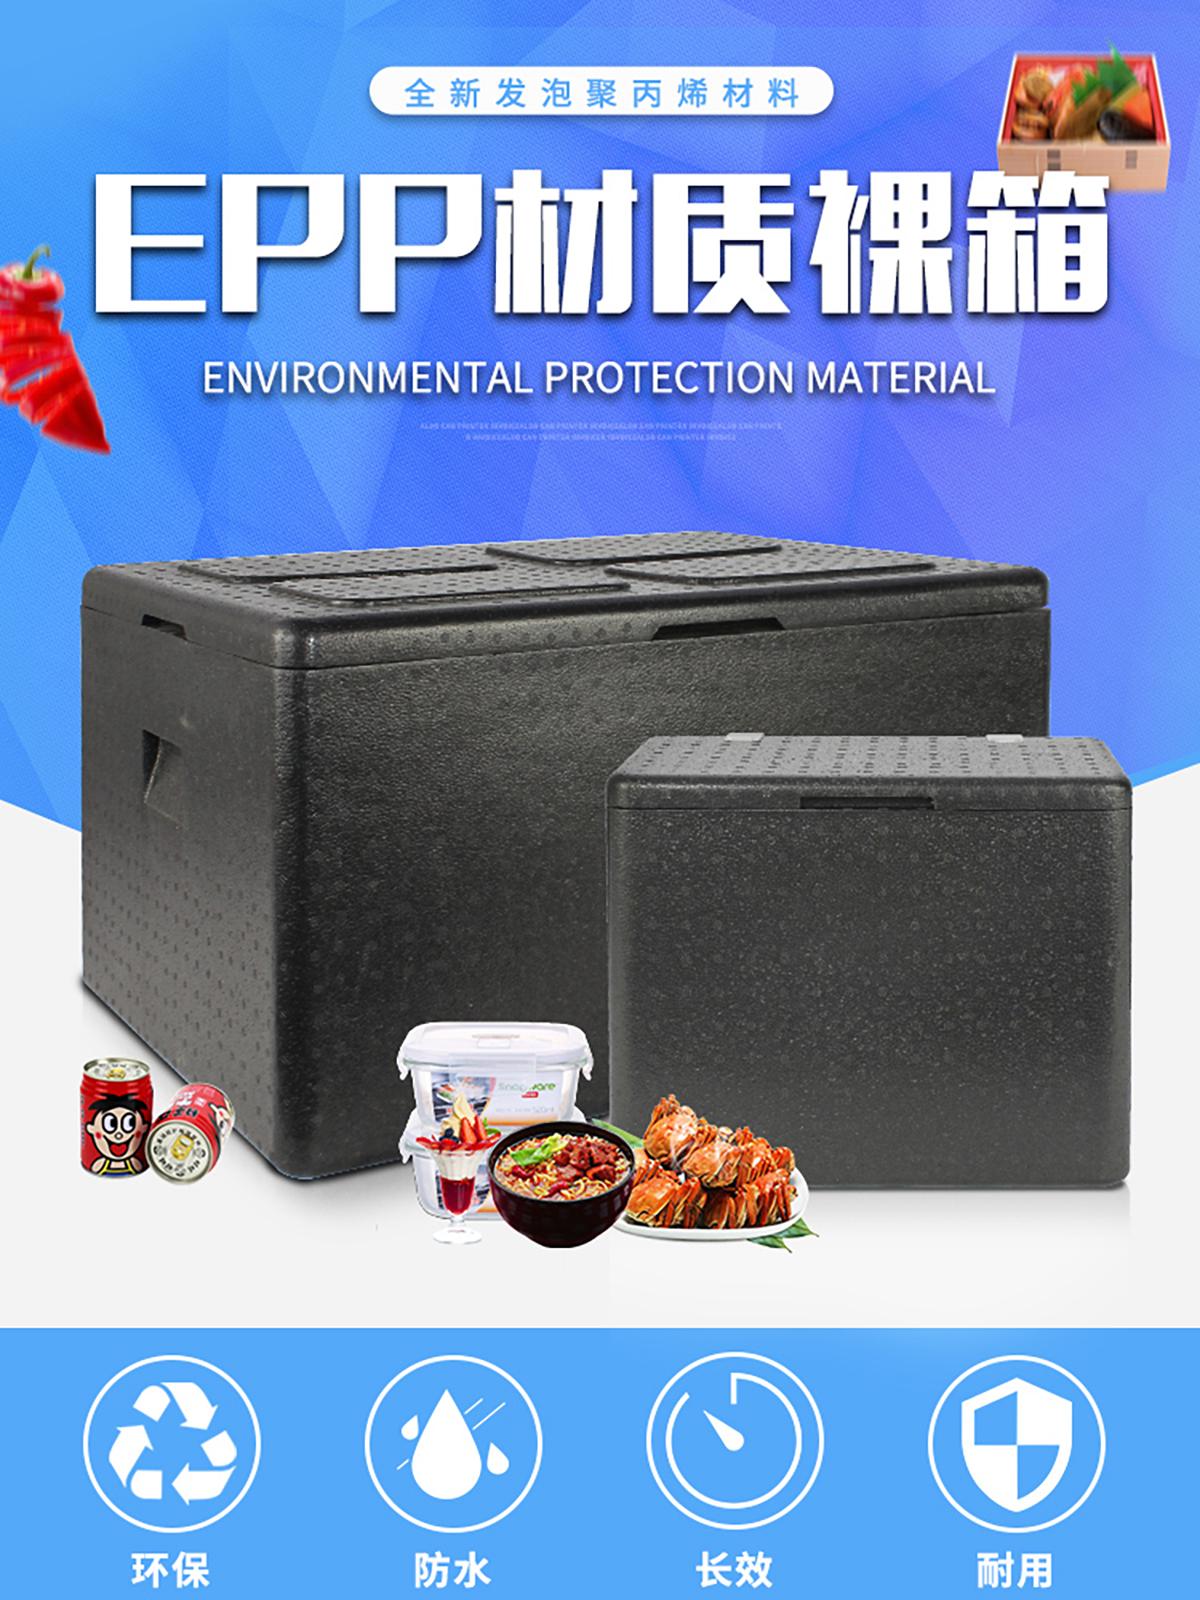 EPP-1